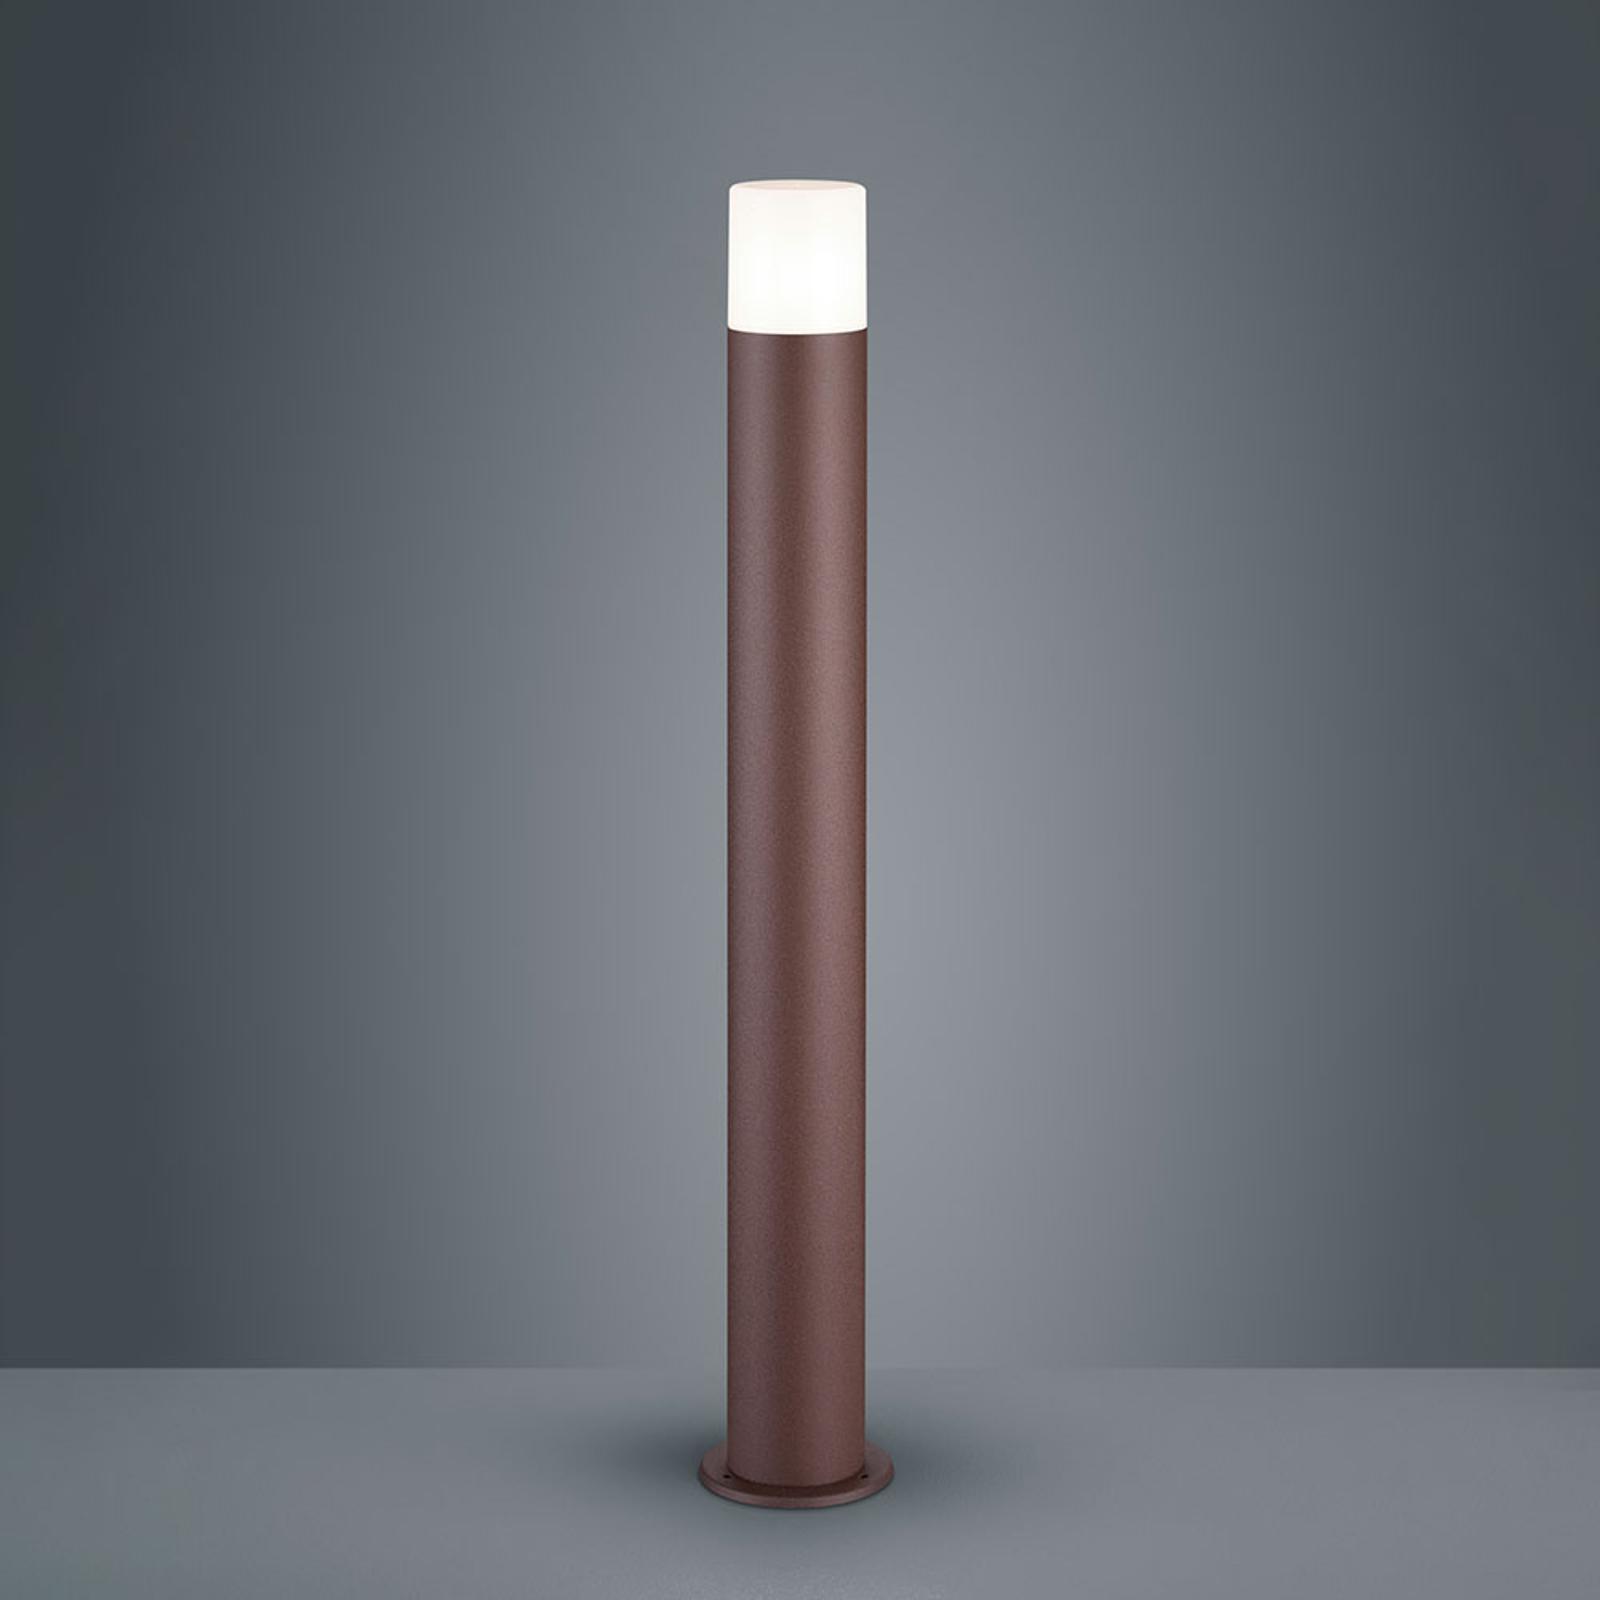 Tuinpadverlichting Hoosic, drukgegoten aluminium